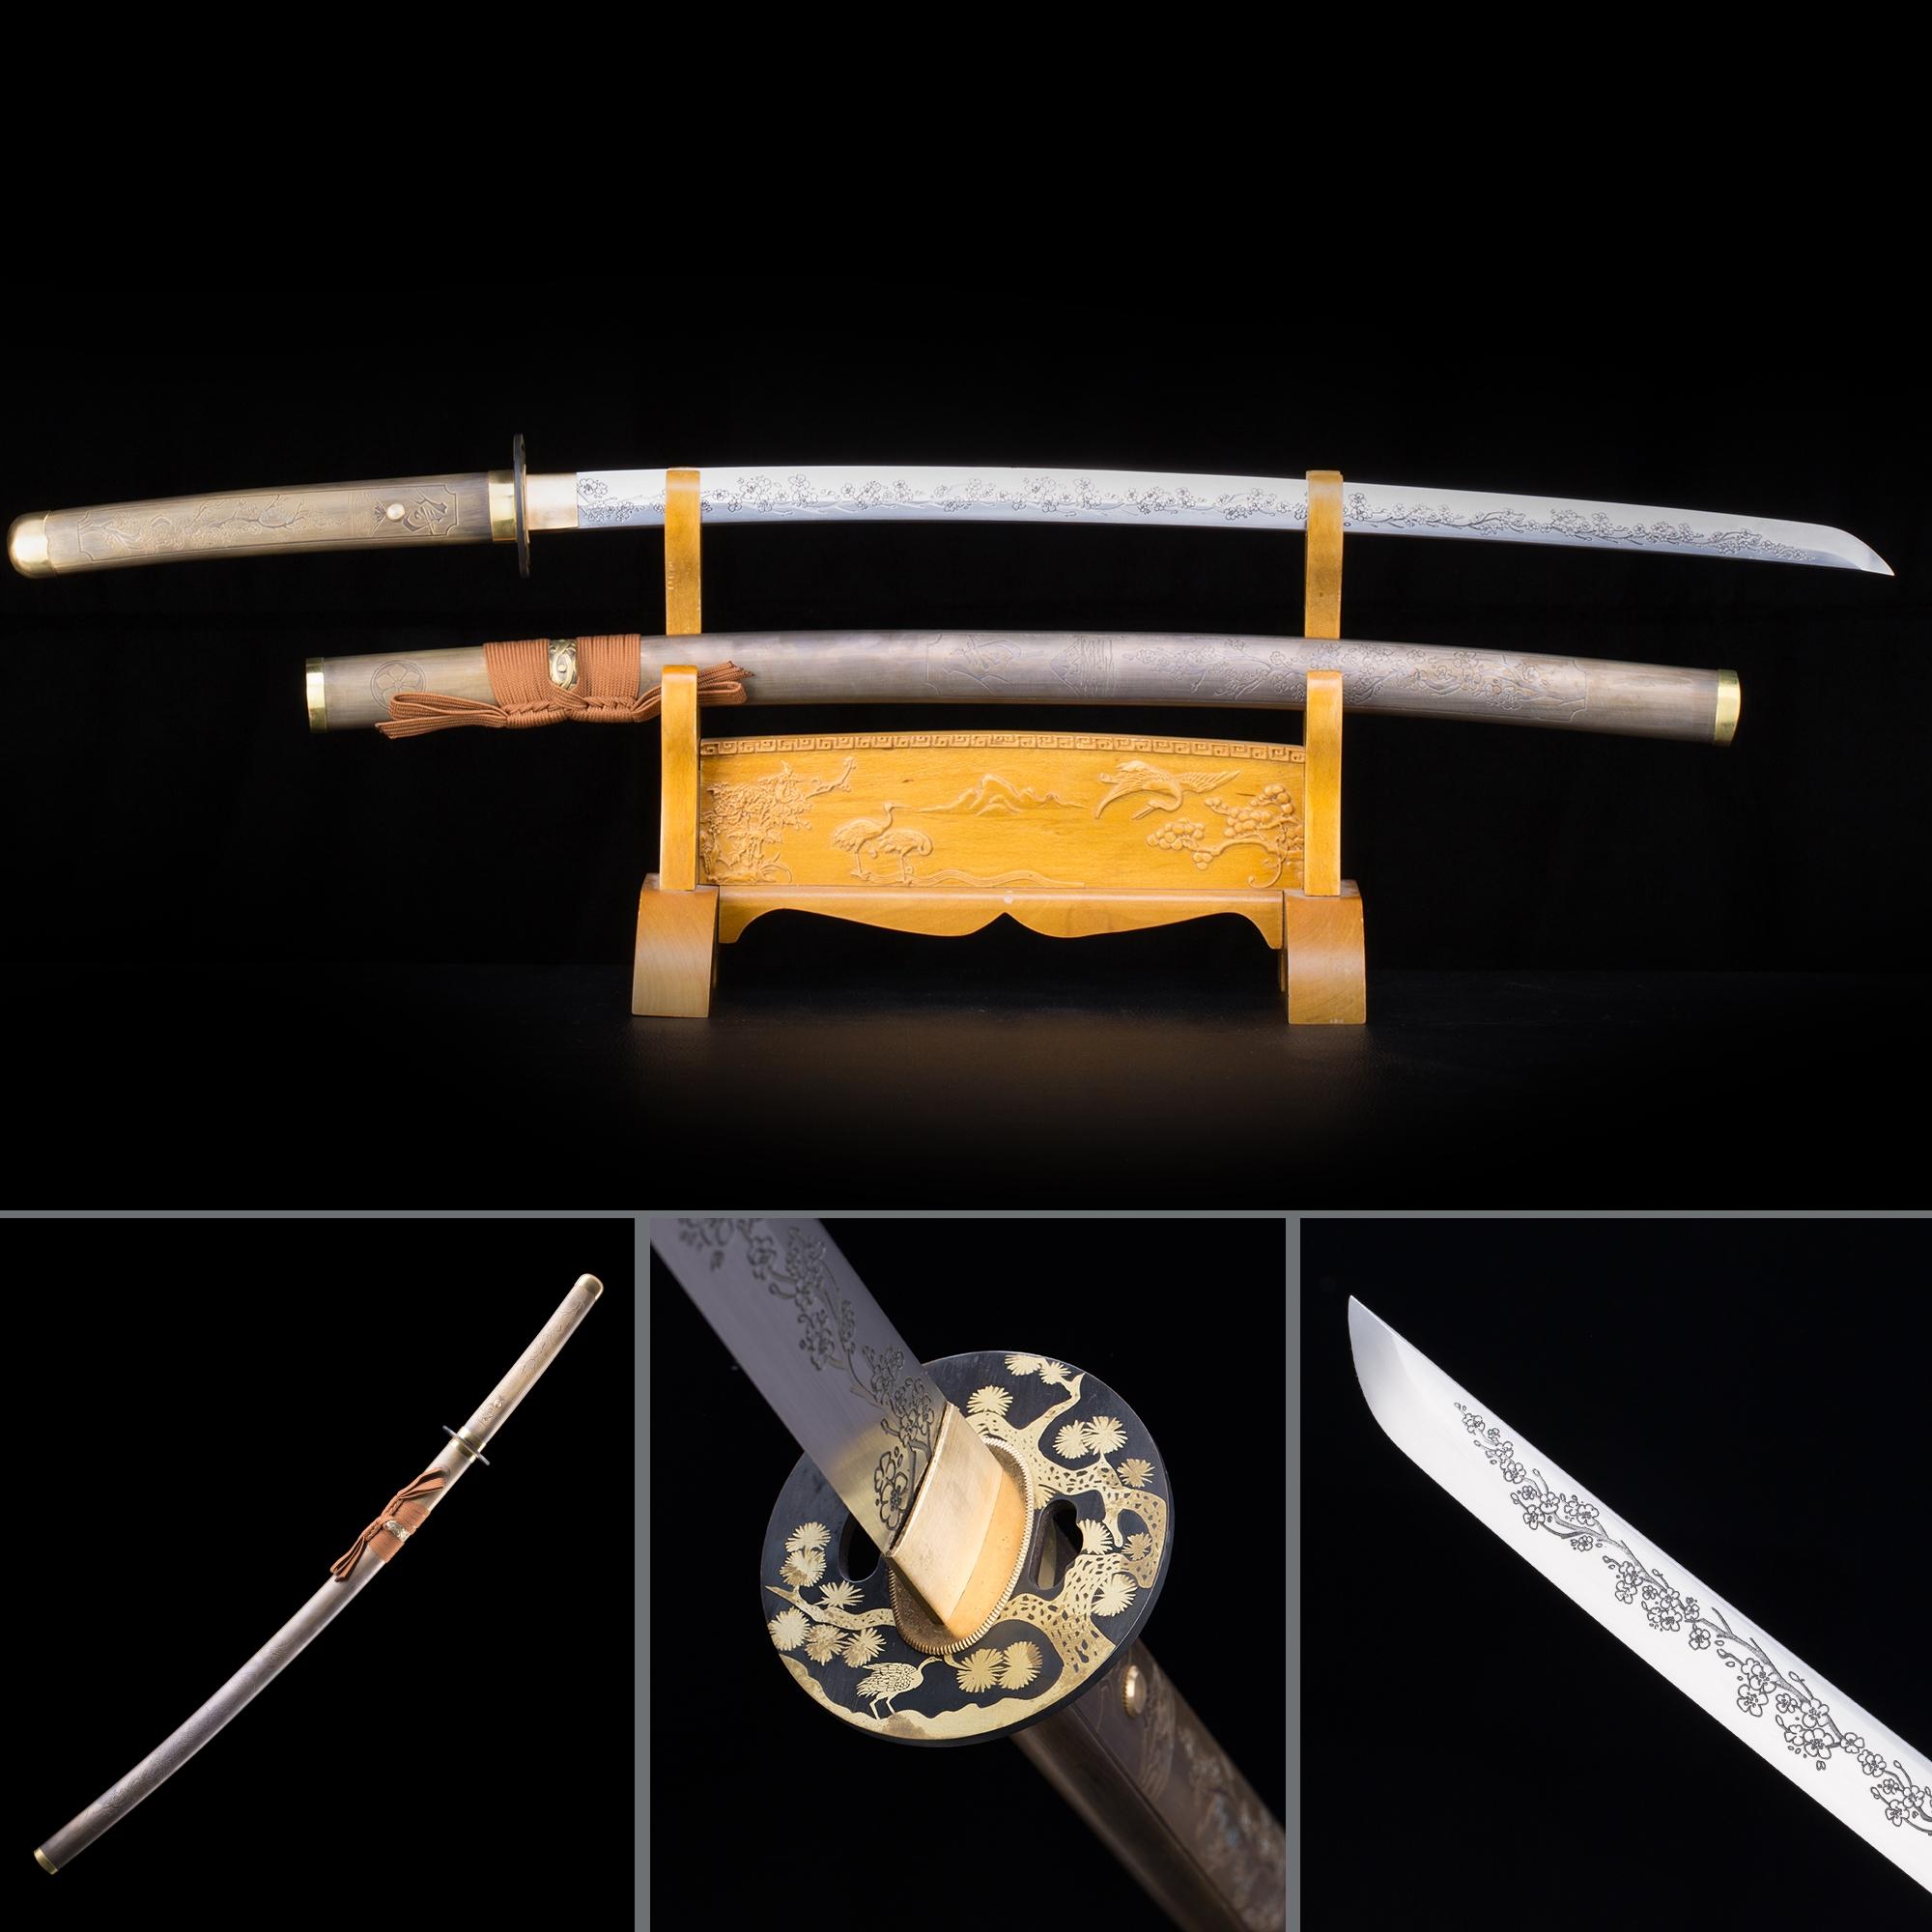 Handmade High Manganese Steel Bronze Saya And Flower Tsuba Real Japanese Katana Samurai Swords